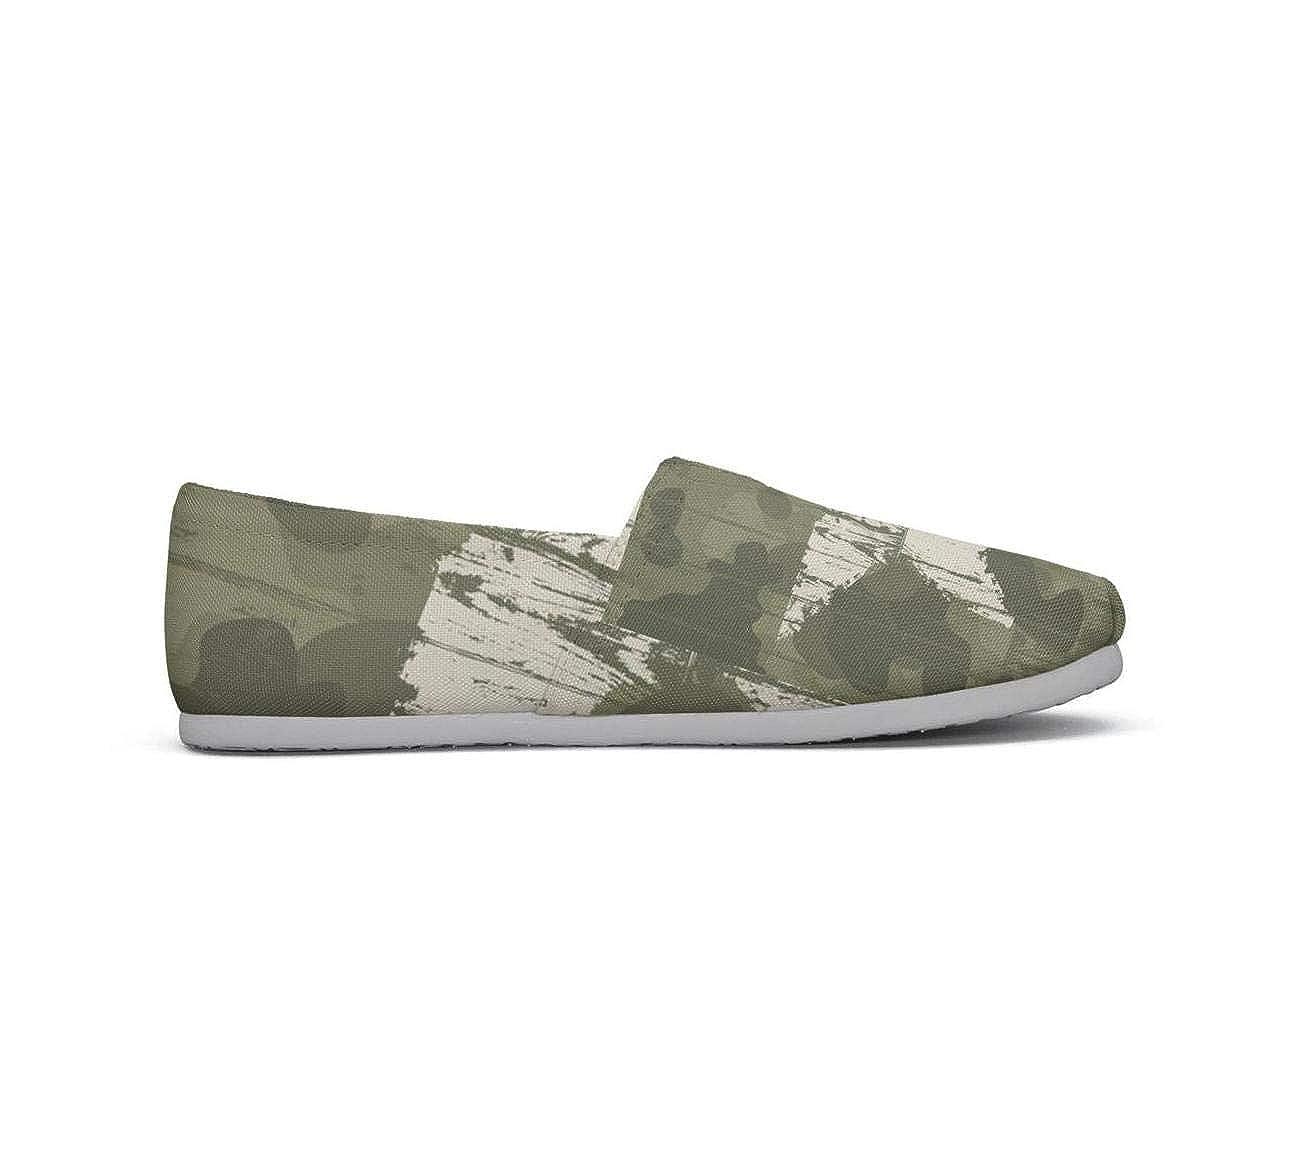 nkfbx Western Khaki Camouflage Fashion Flat Trainers for Girls Walking